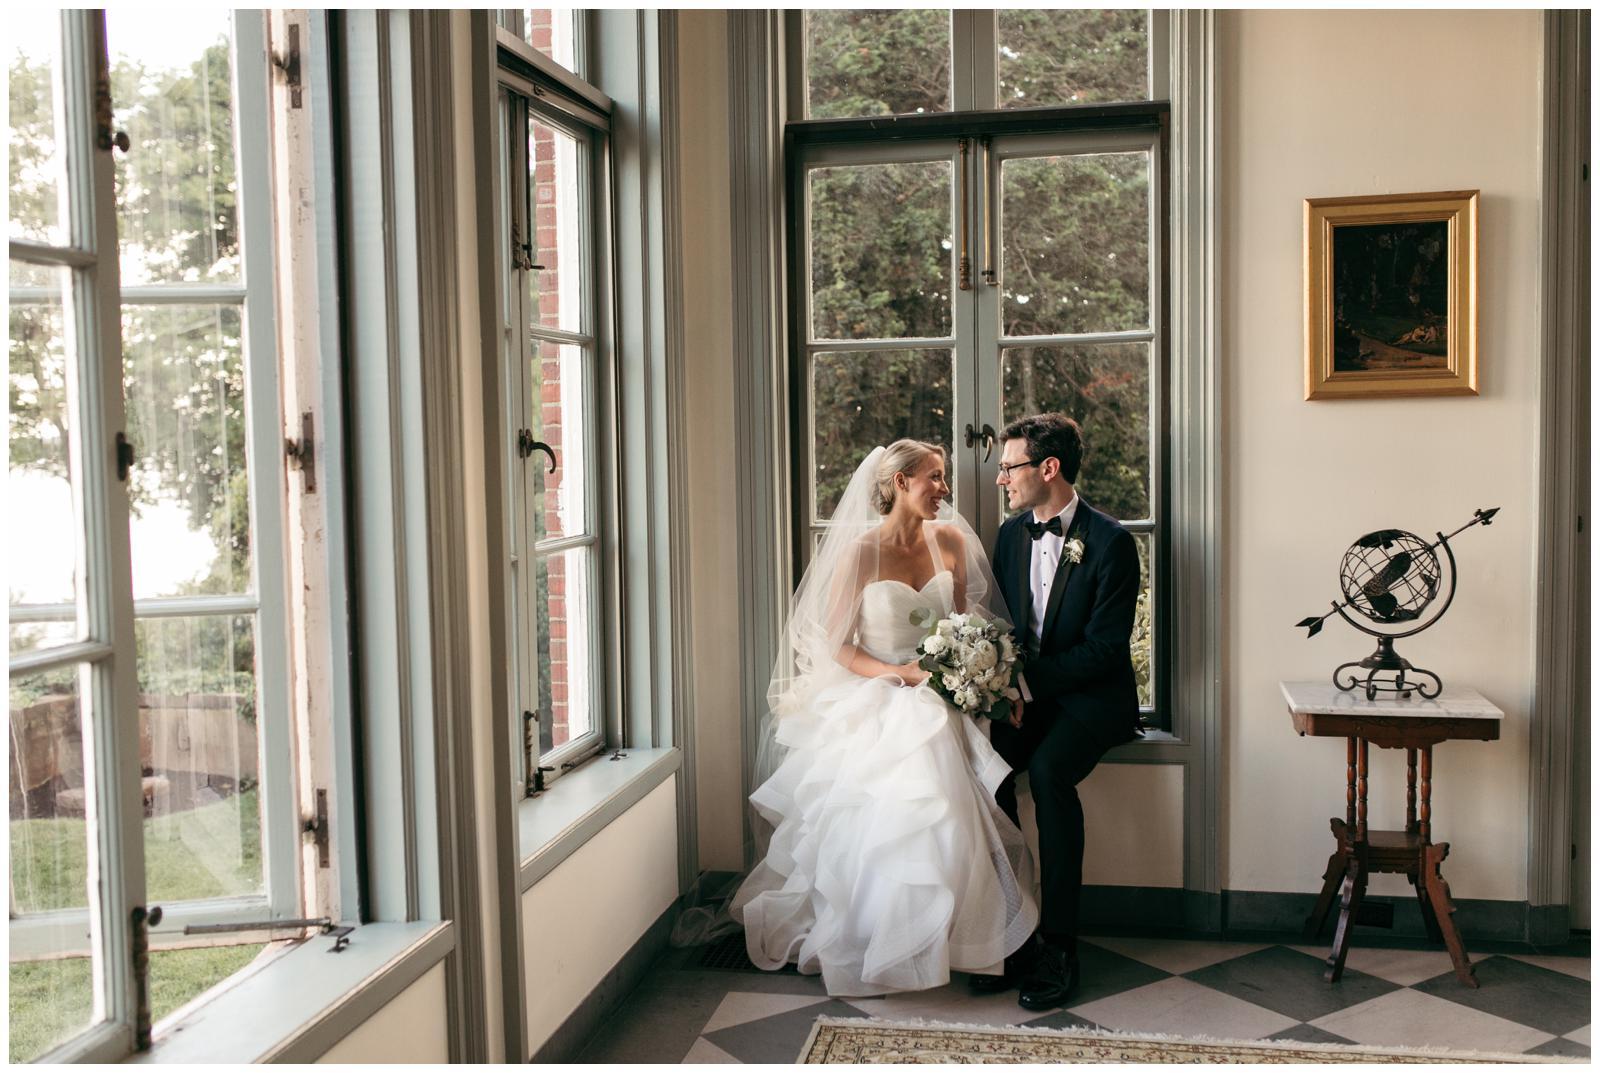 Best Massachusetts wedding photographer